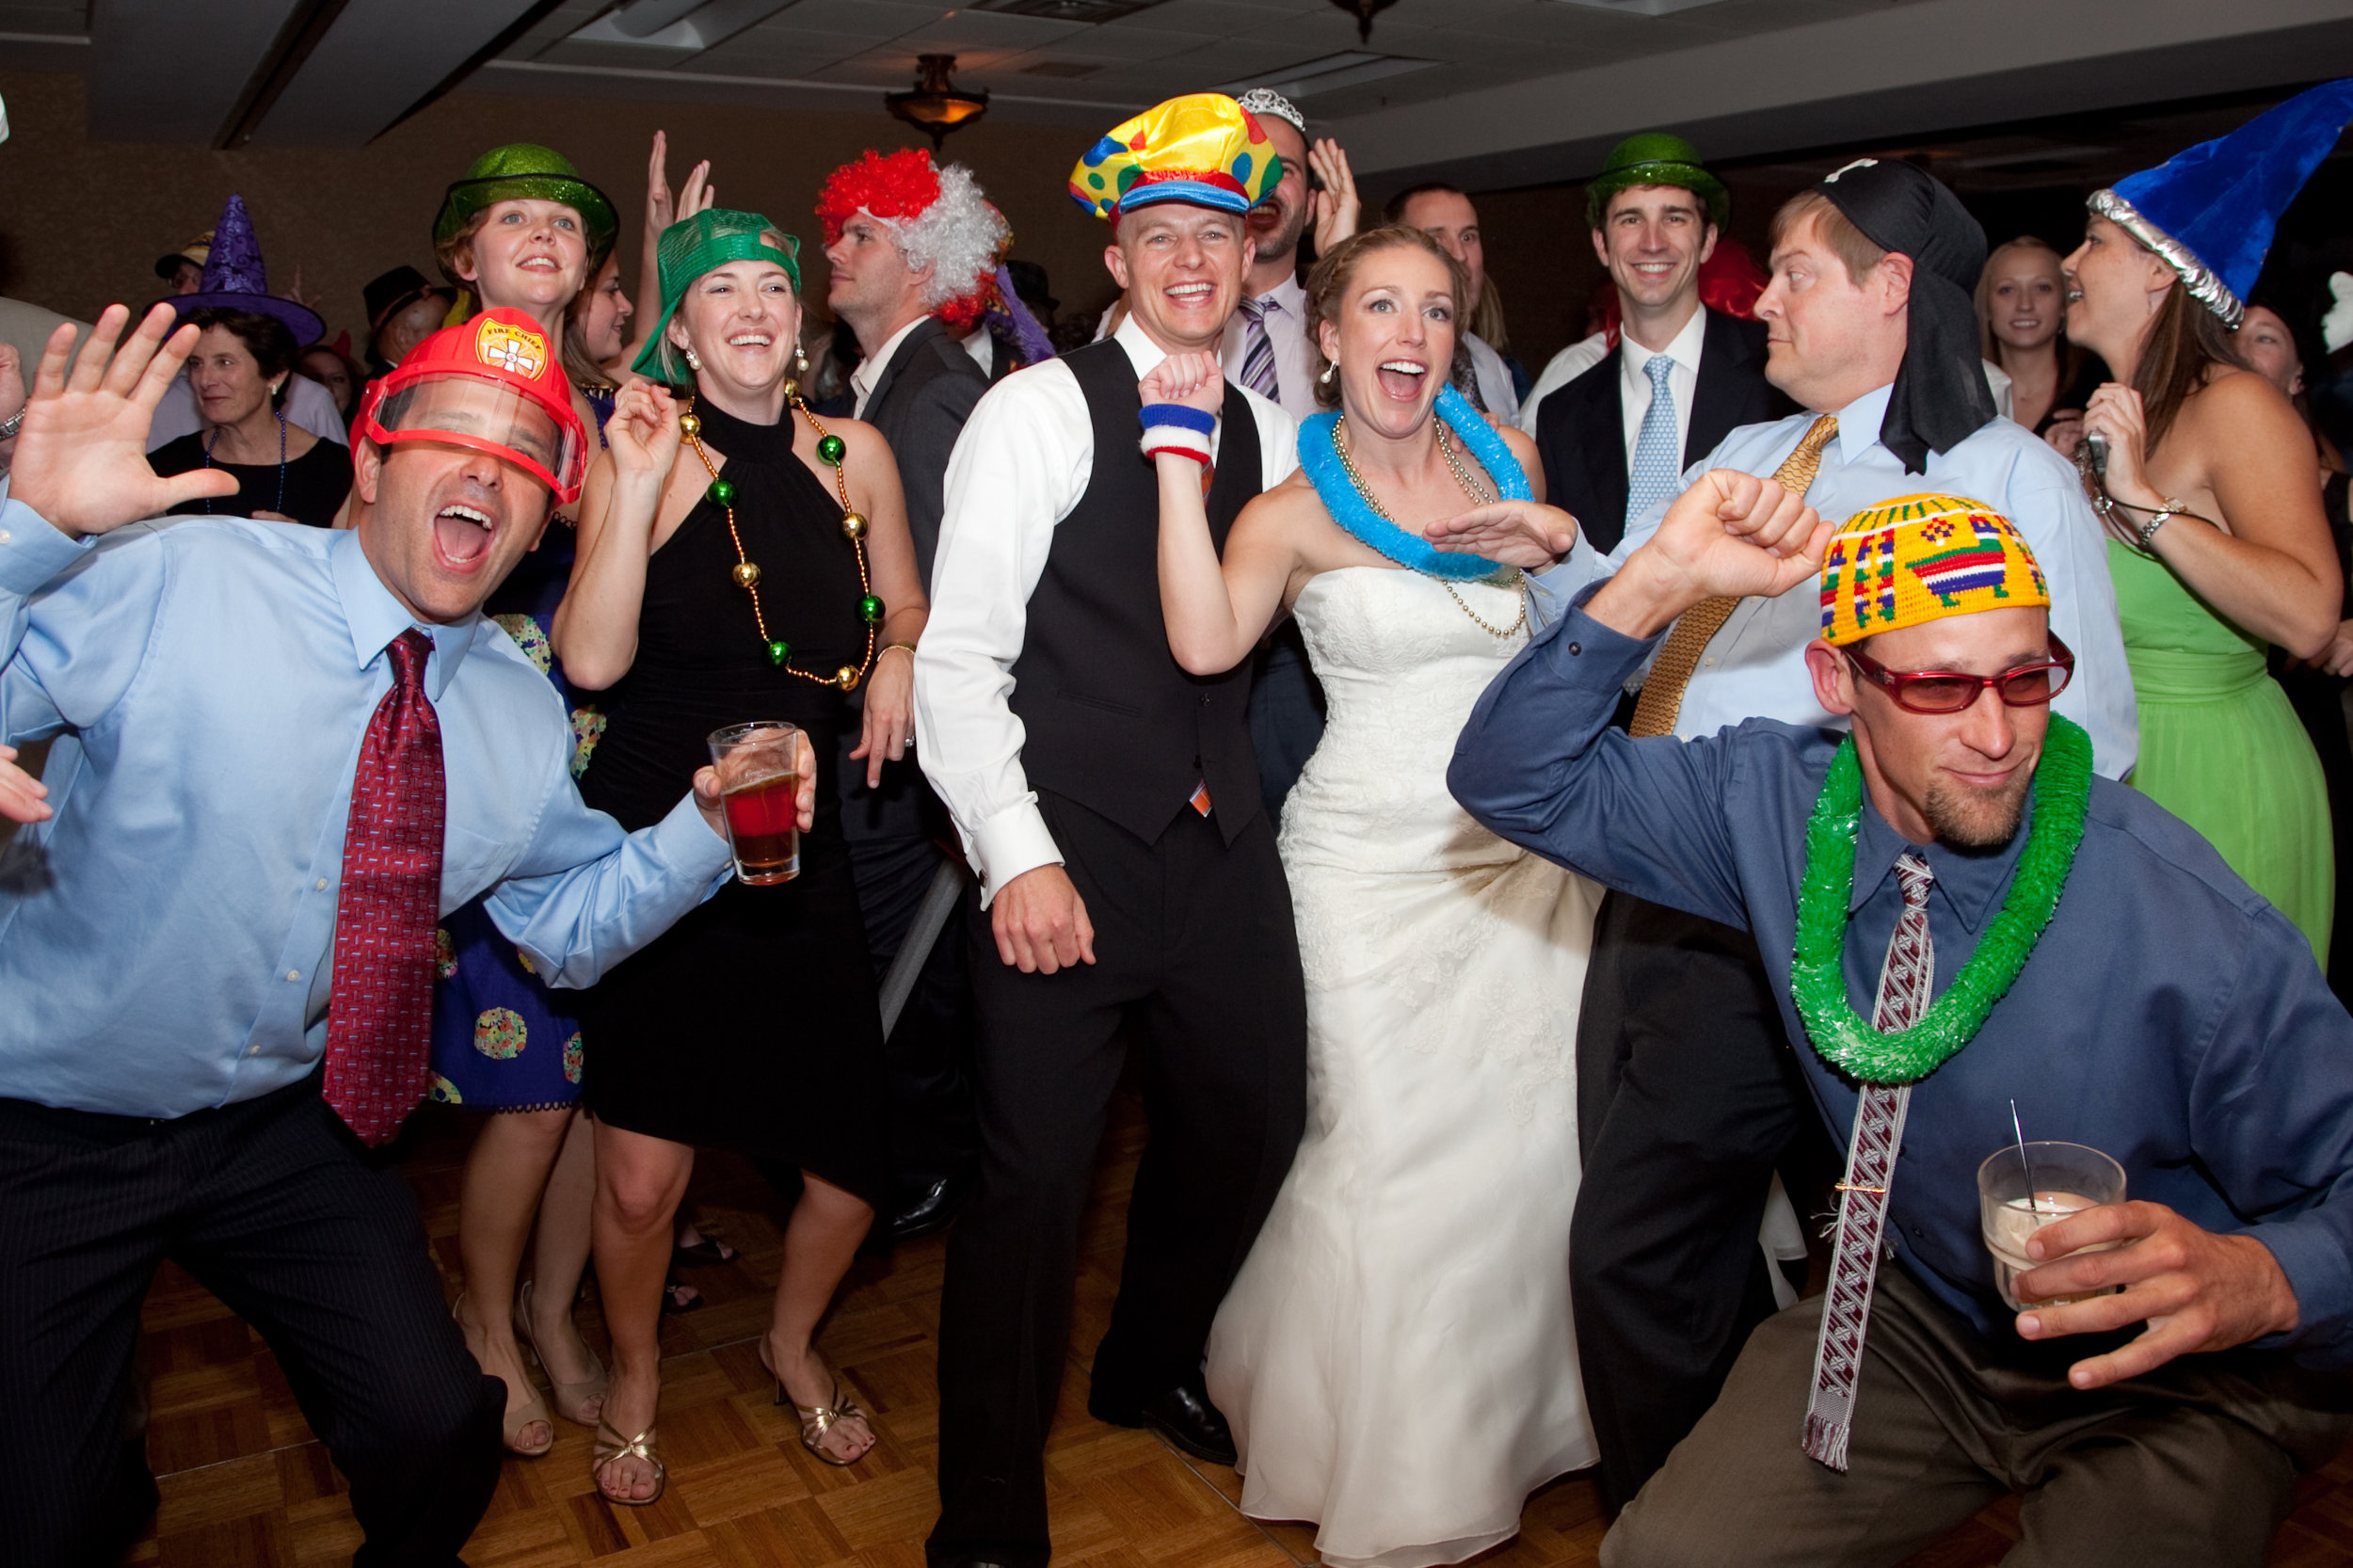 Wedding-bands-Vail-axelphoto.jpg